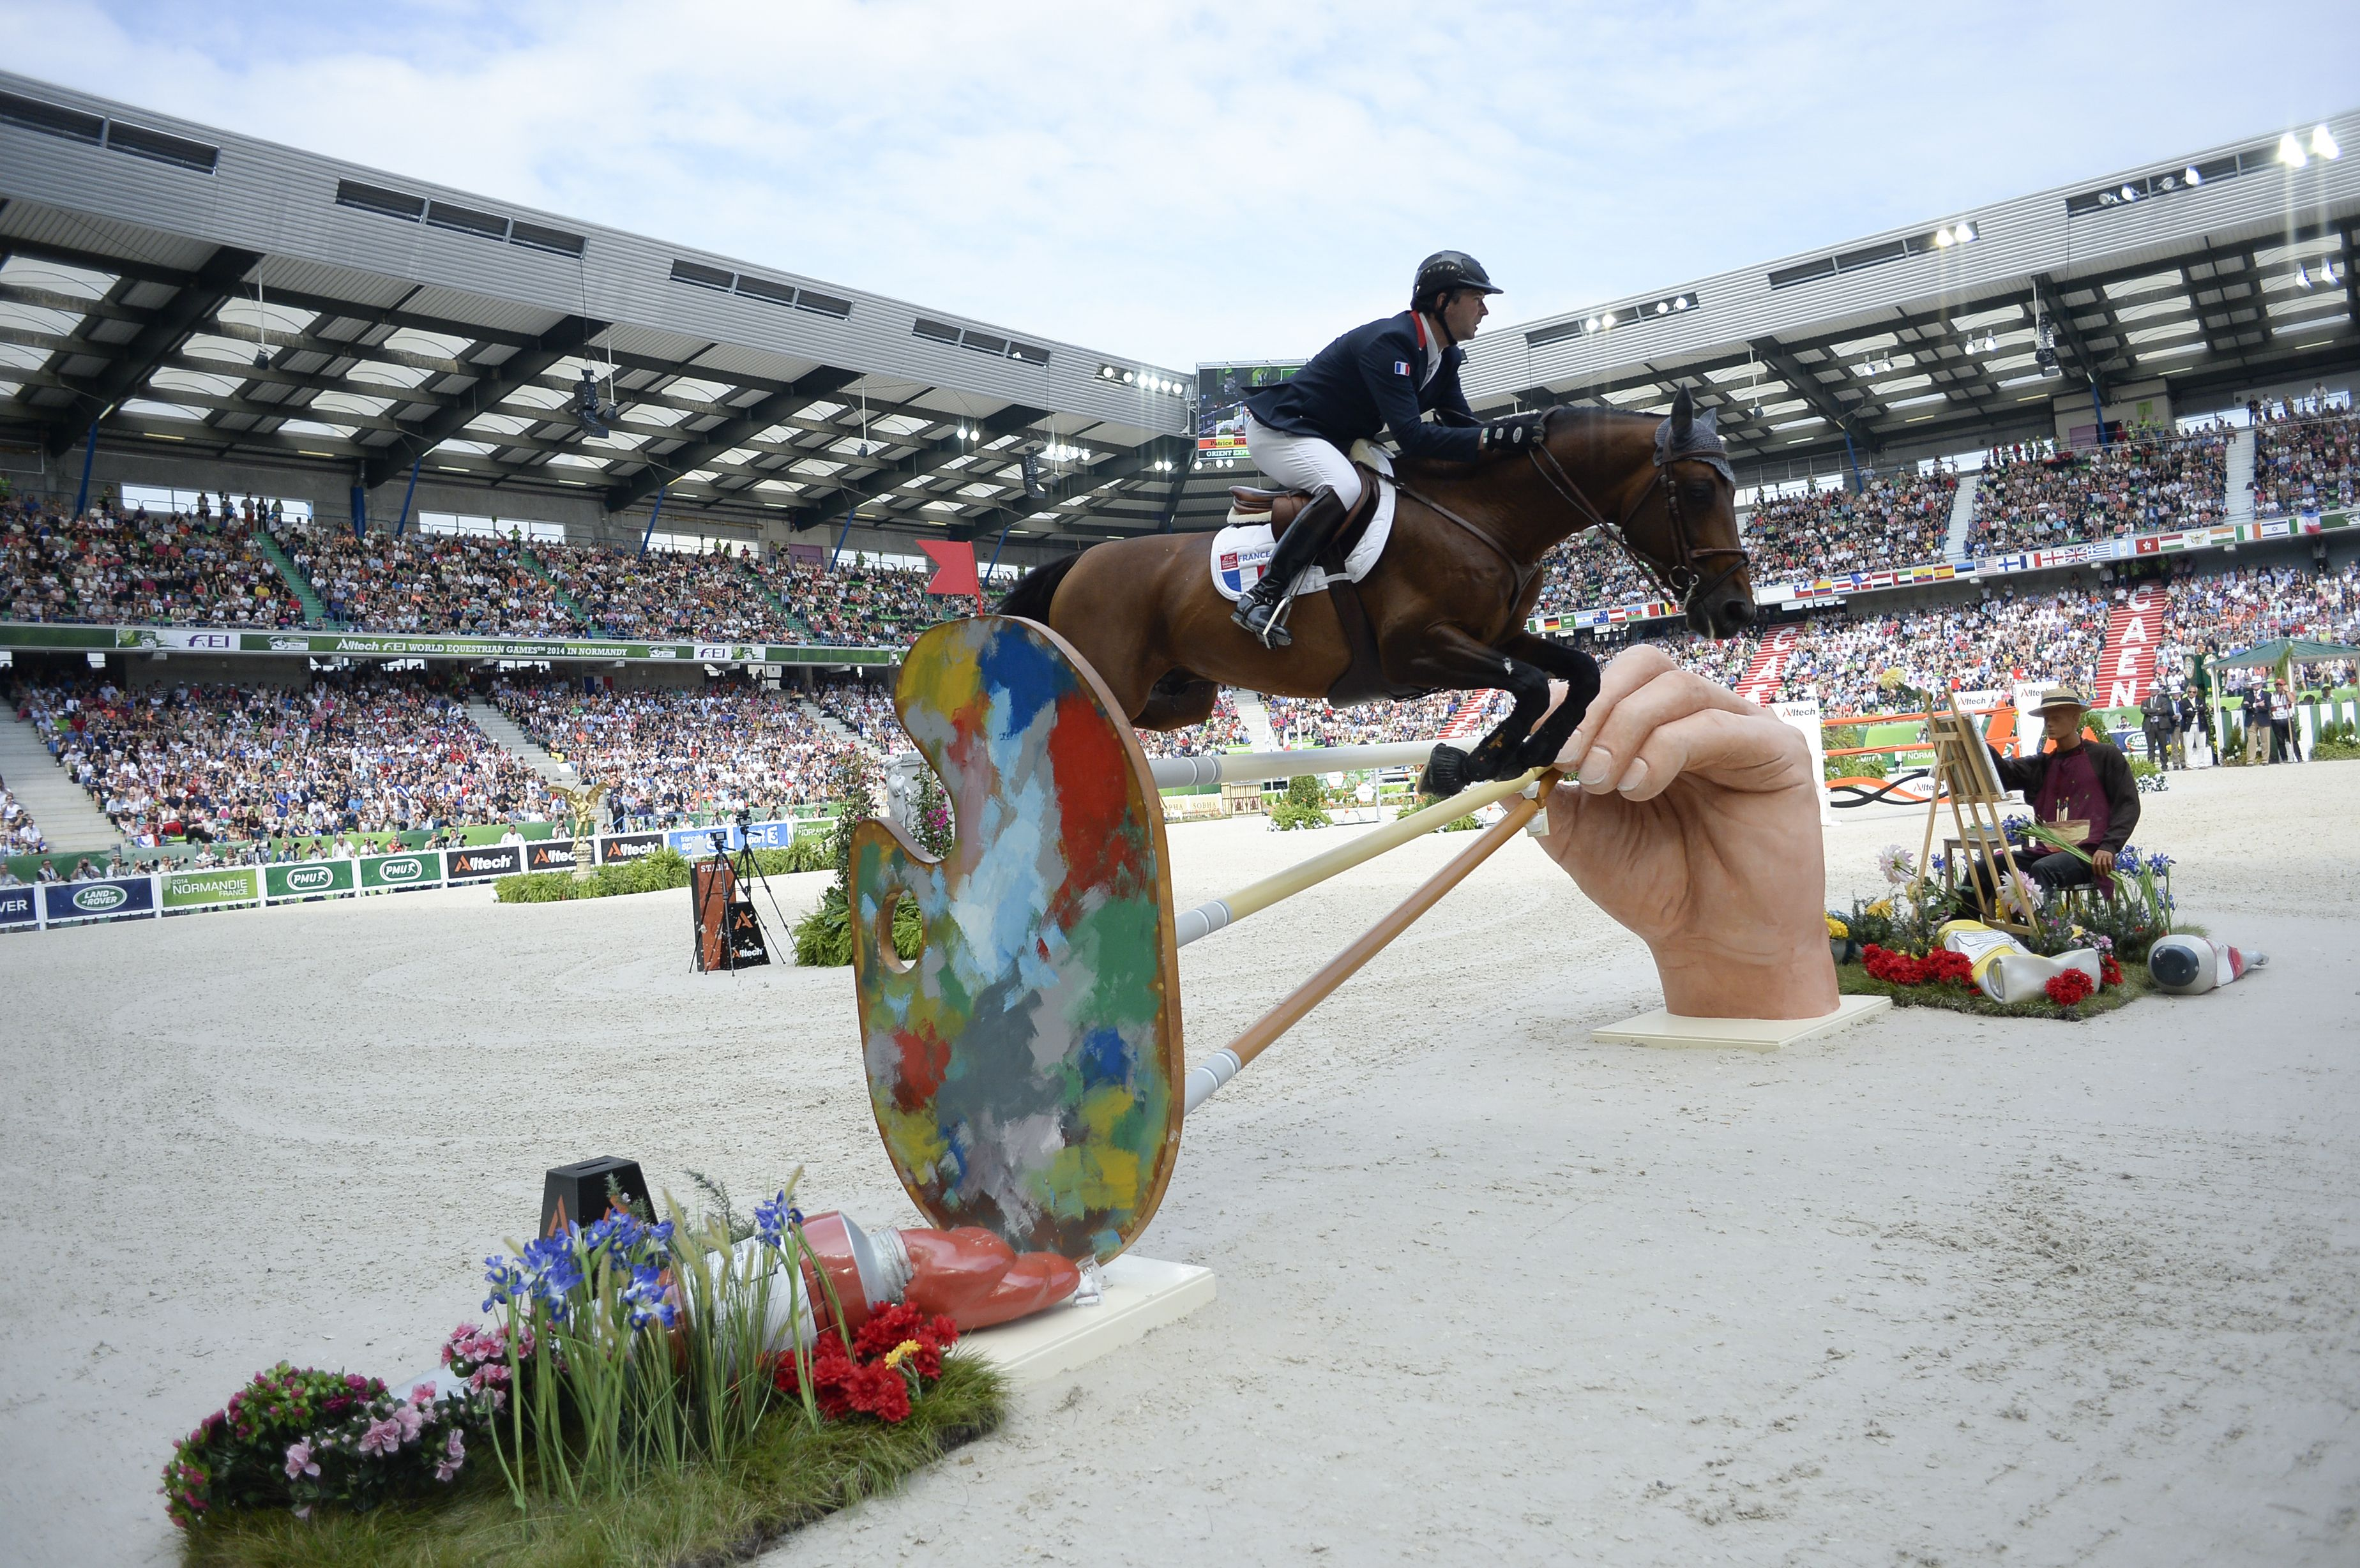 Patrice #DELAVEAU #WEG2014 #Normandy2014 #France #Horses #Equestrian